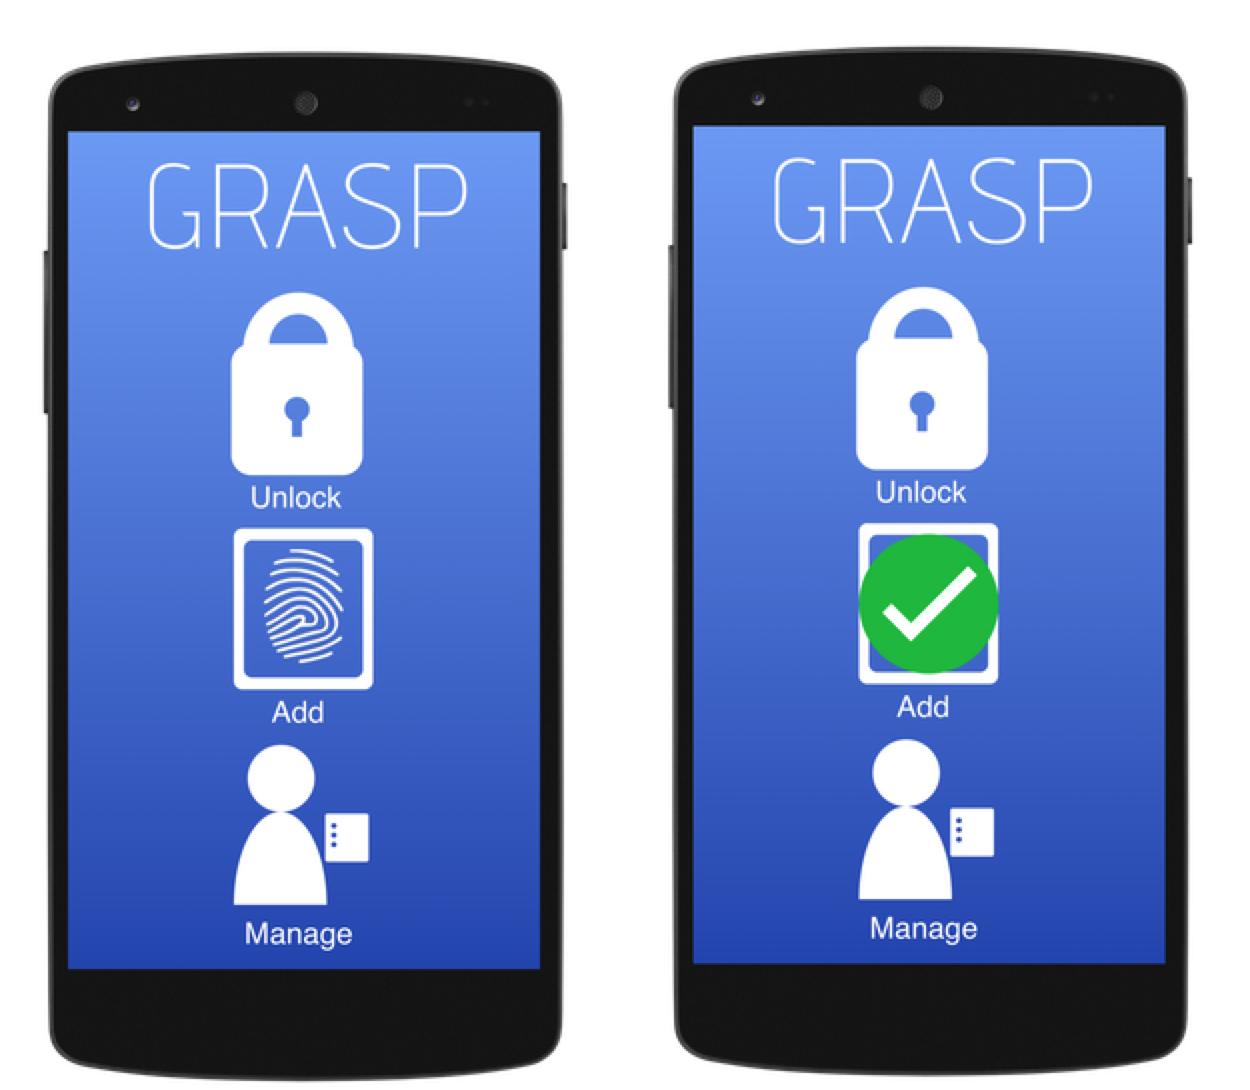 Grasp Lock 3